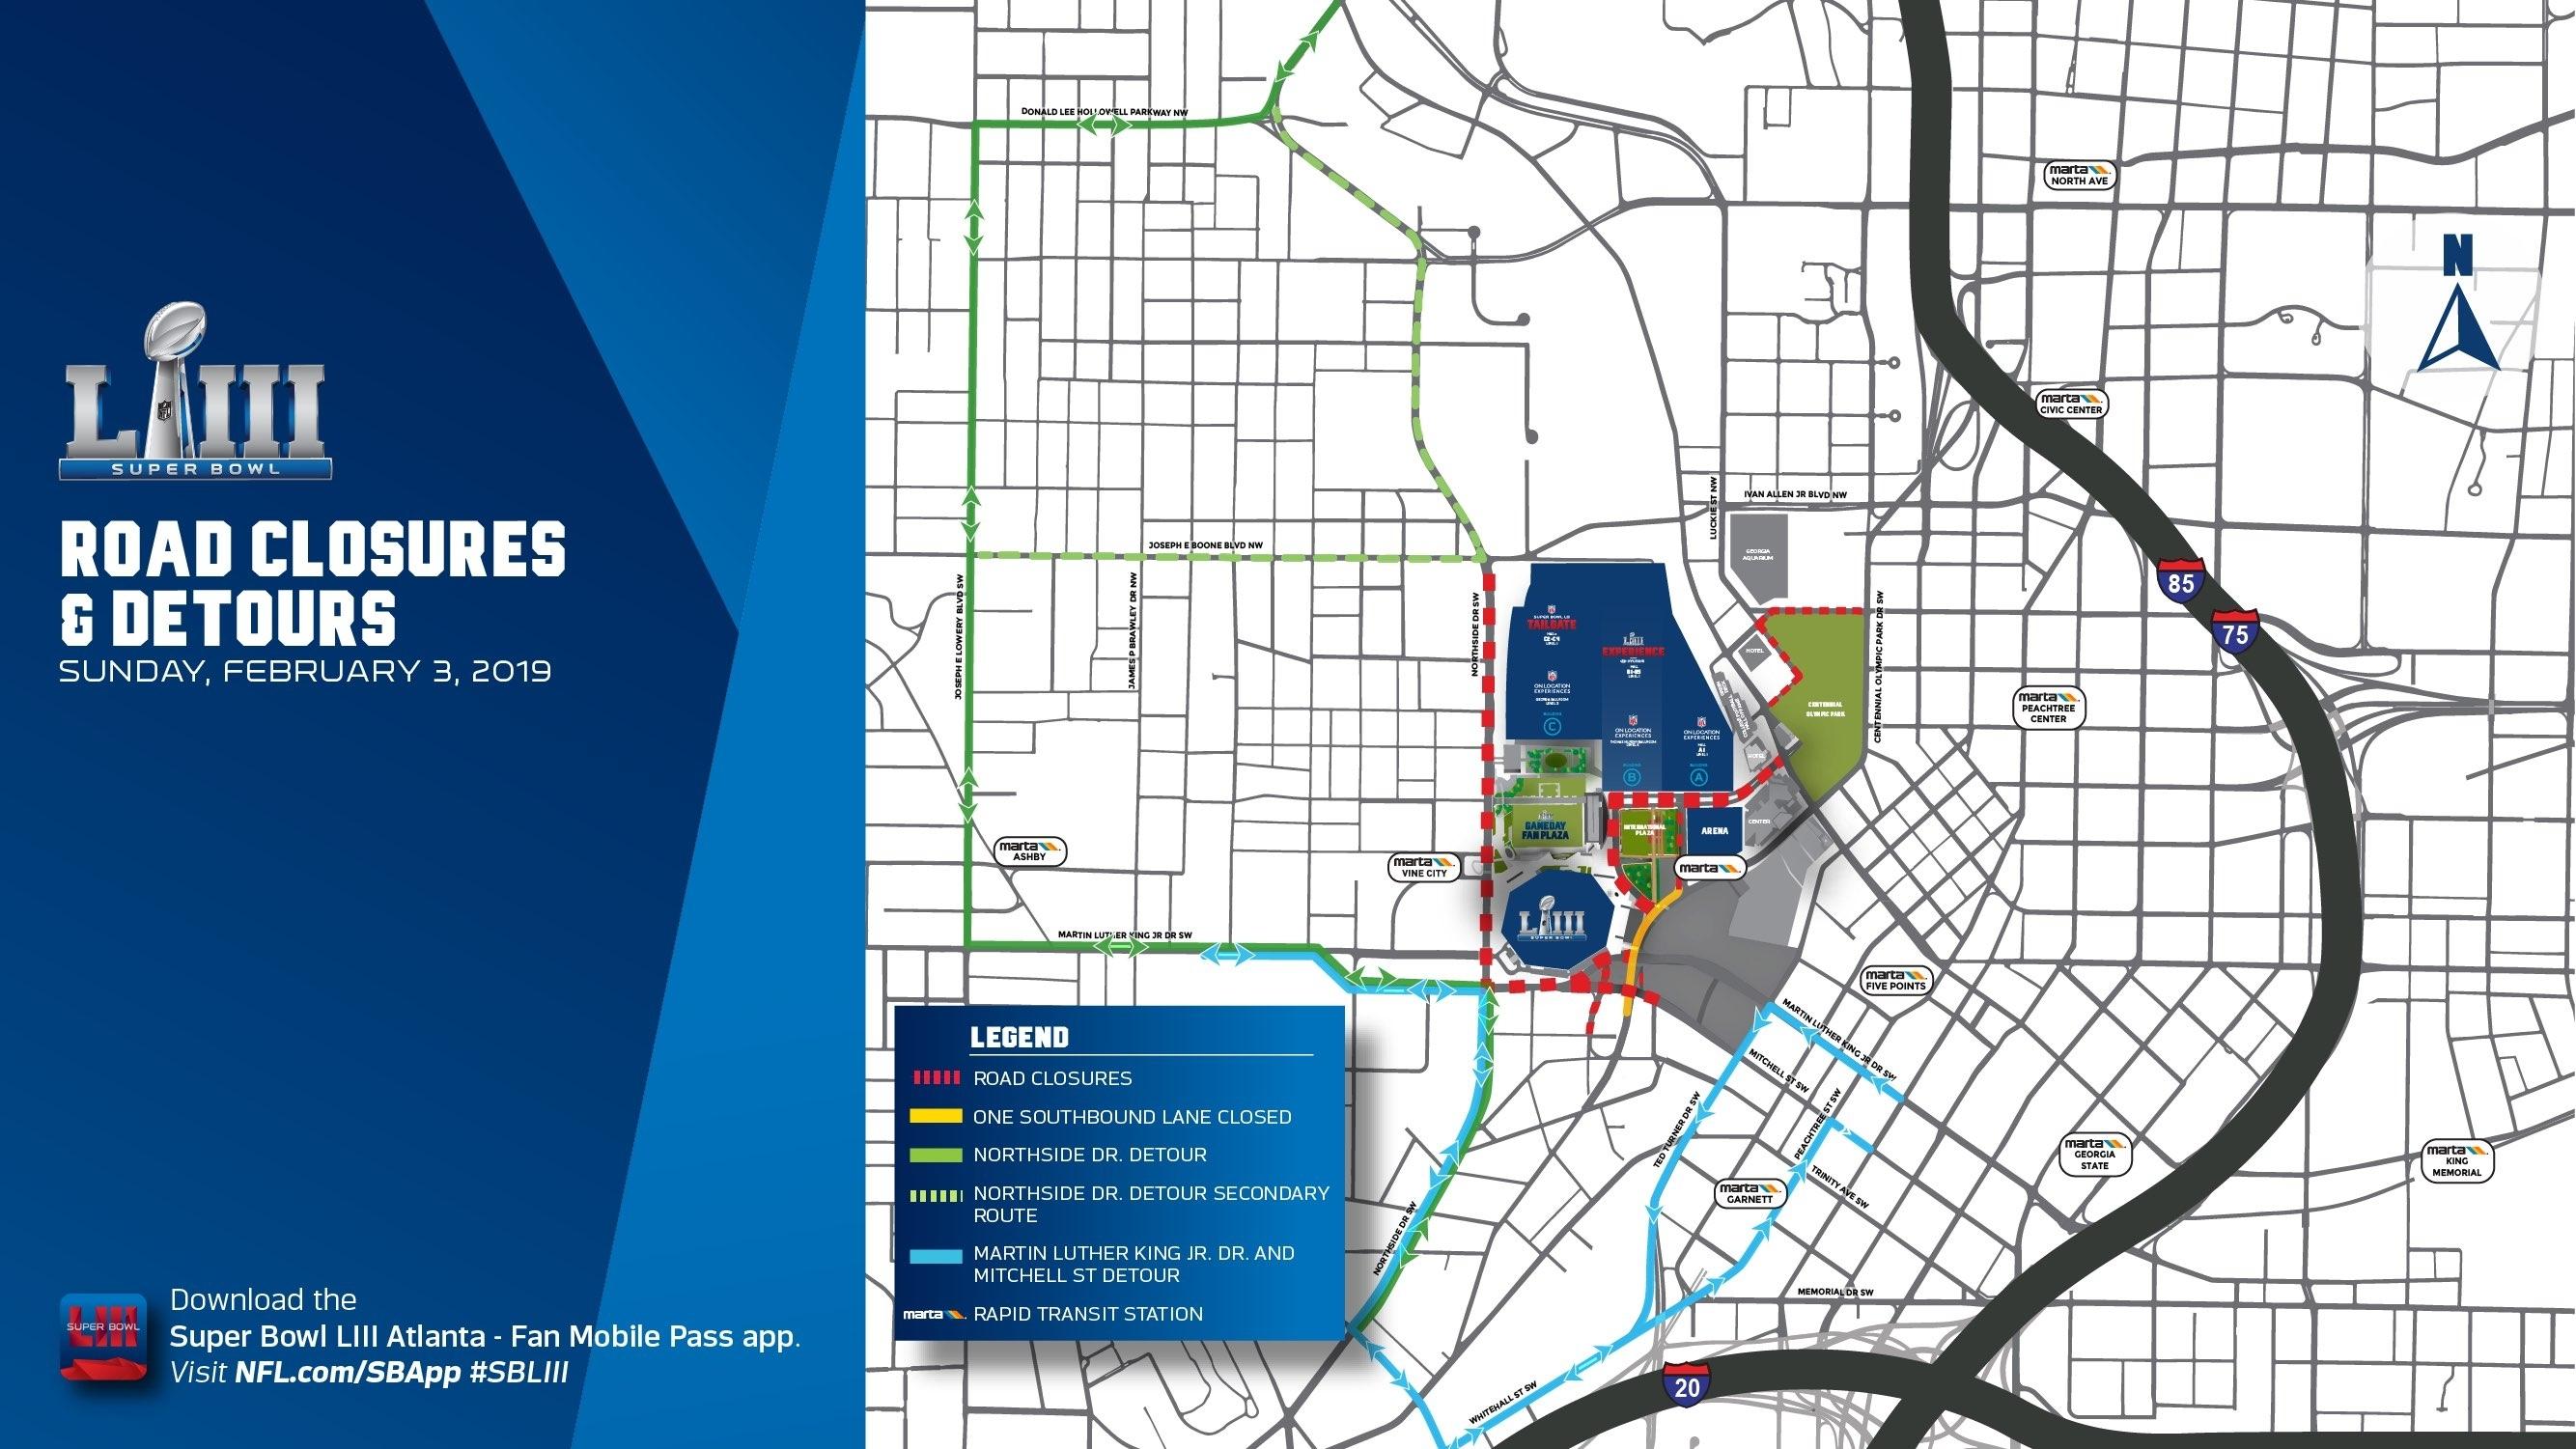 Gameday-Road-Closure-Map Copy - Mercedes Benz Stadium pertaining to Super Bowl Liii Fan Map